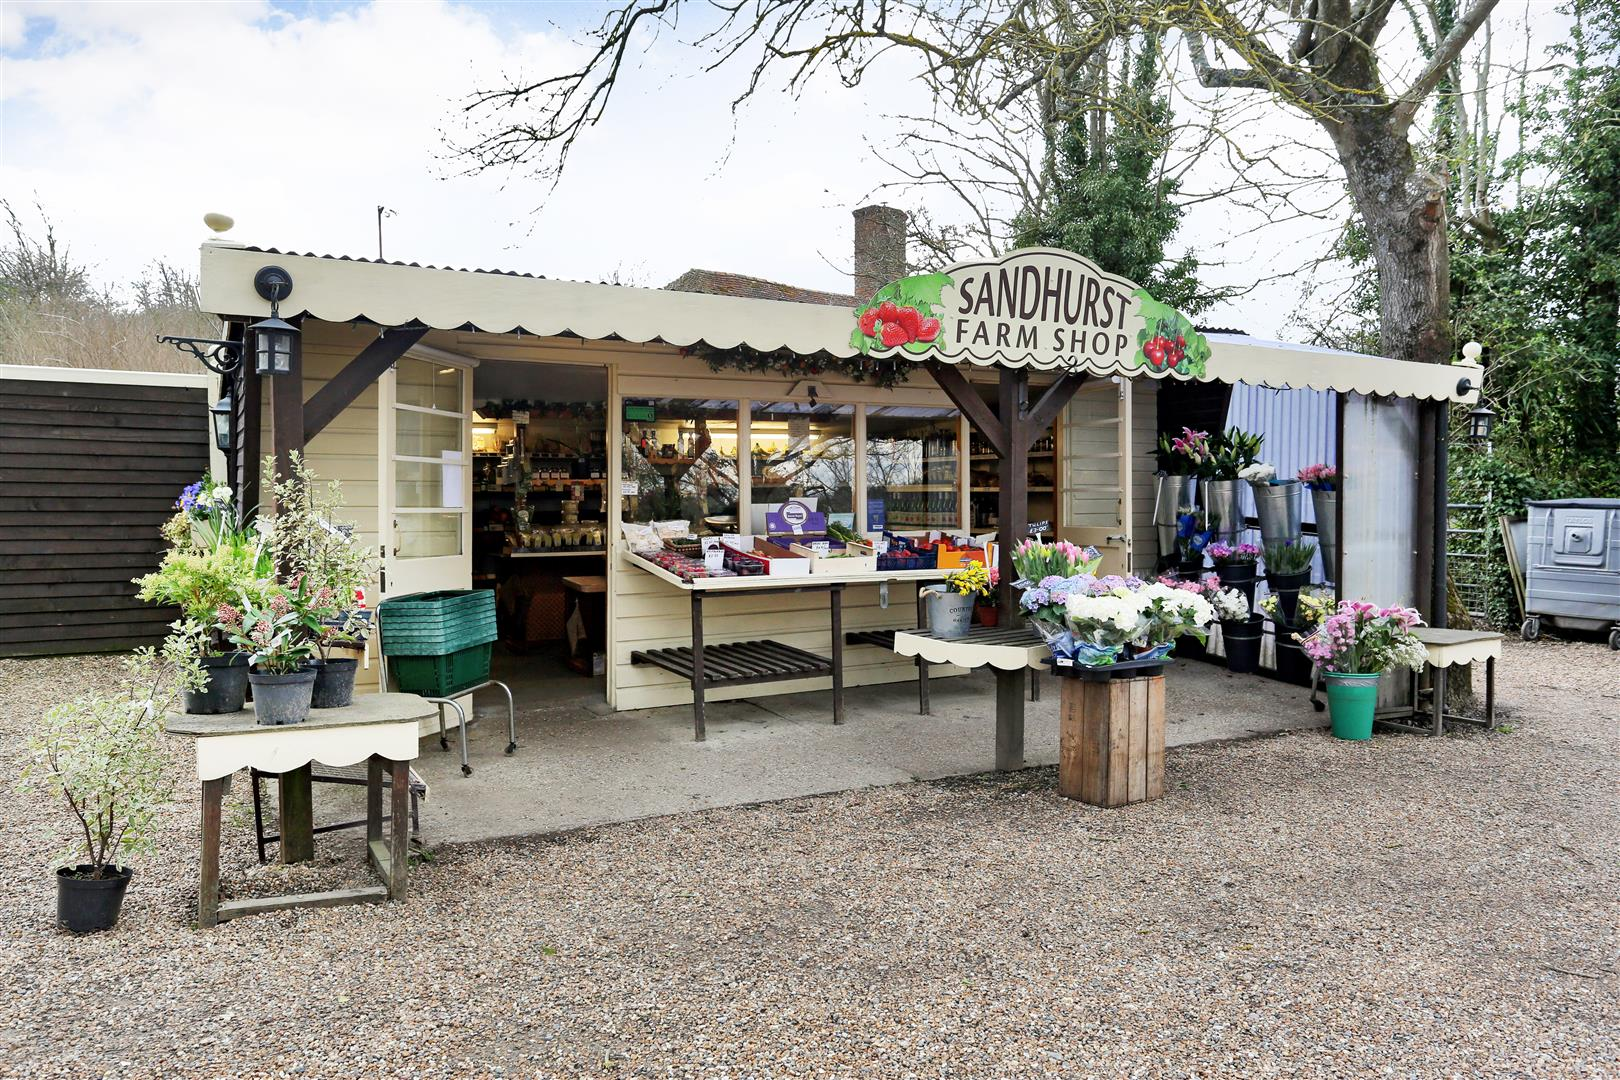 Sandhurst Farm Shop Queen Street Sandhurst Cranbrook